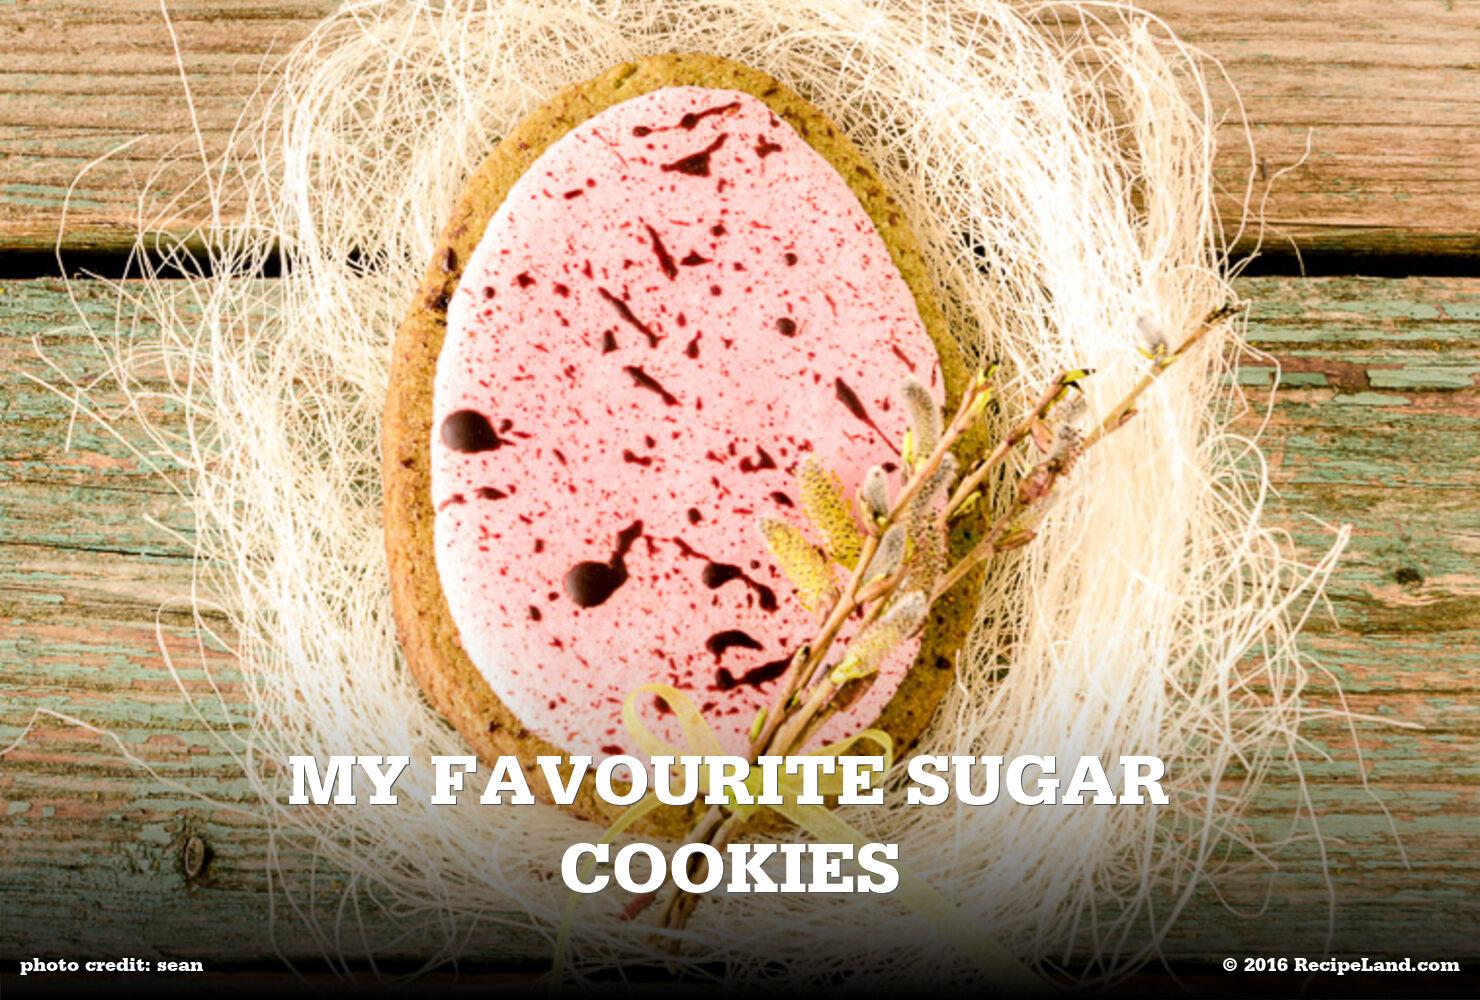 My Favourite Sugar Cookies